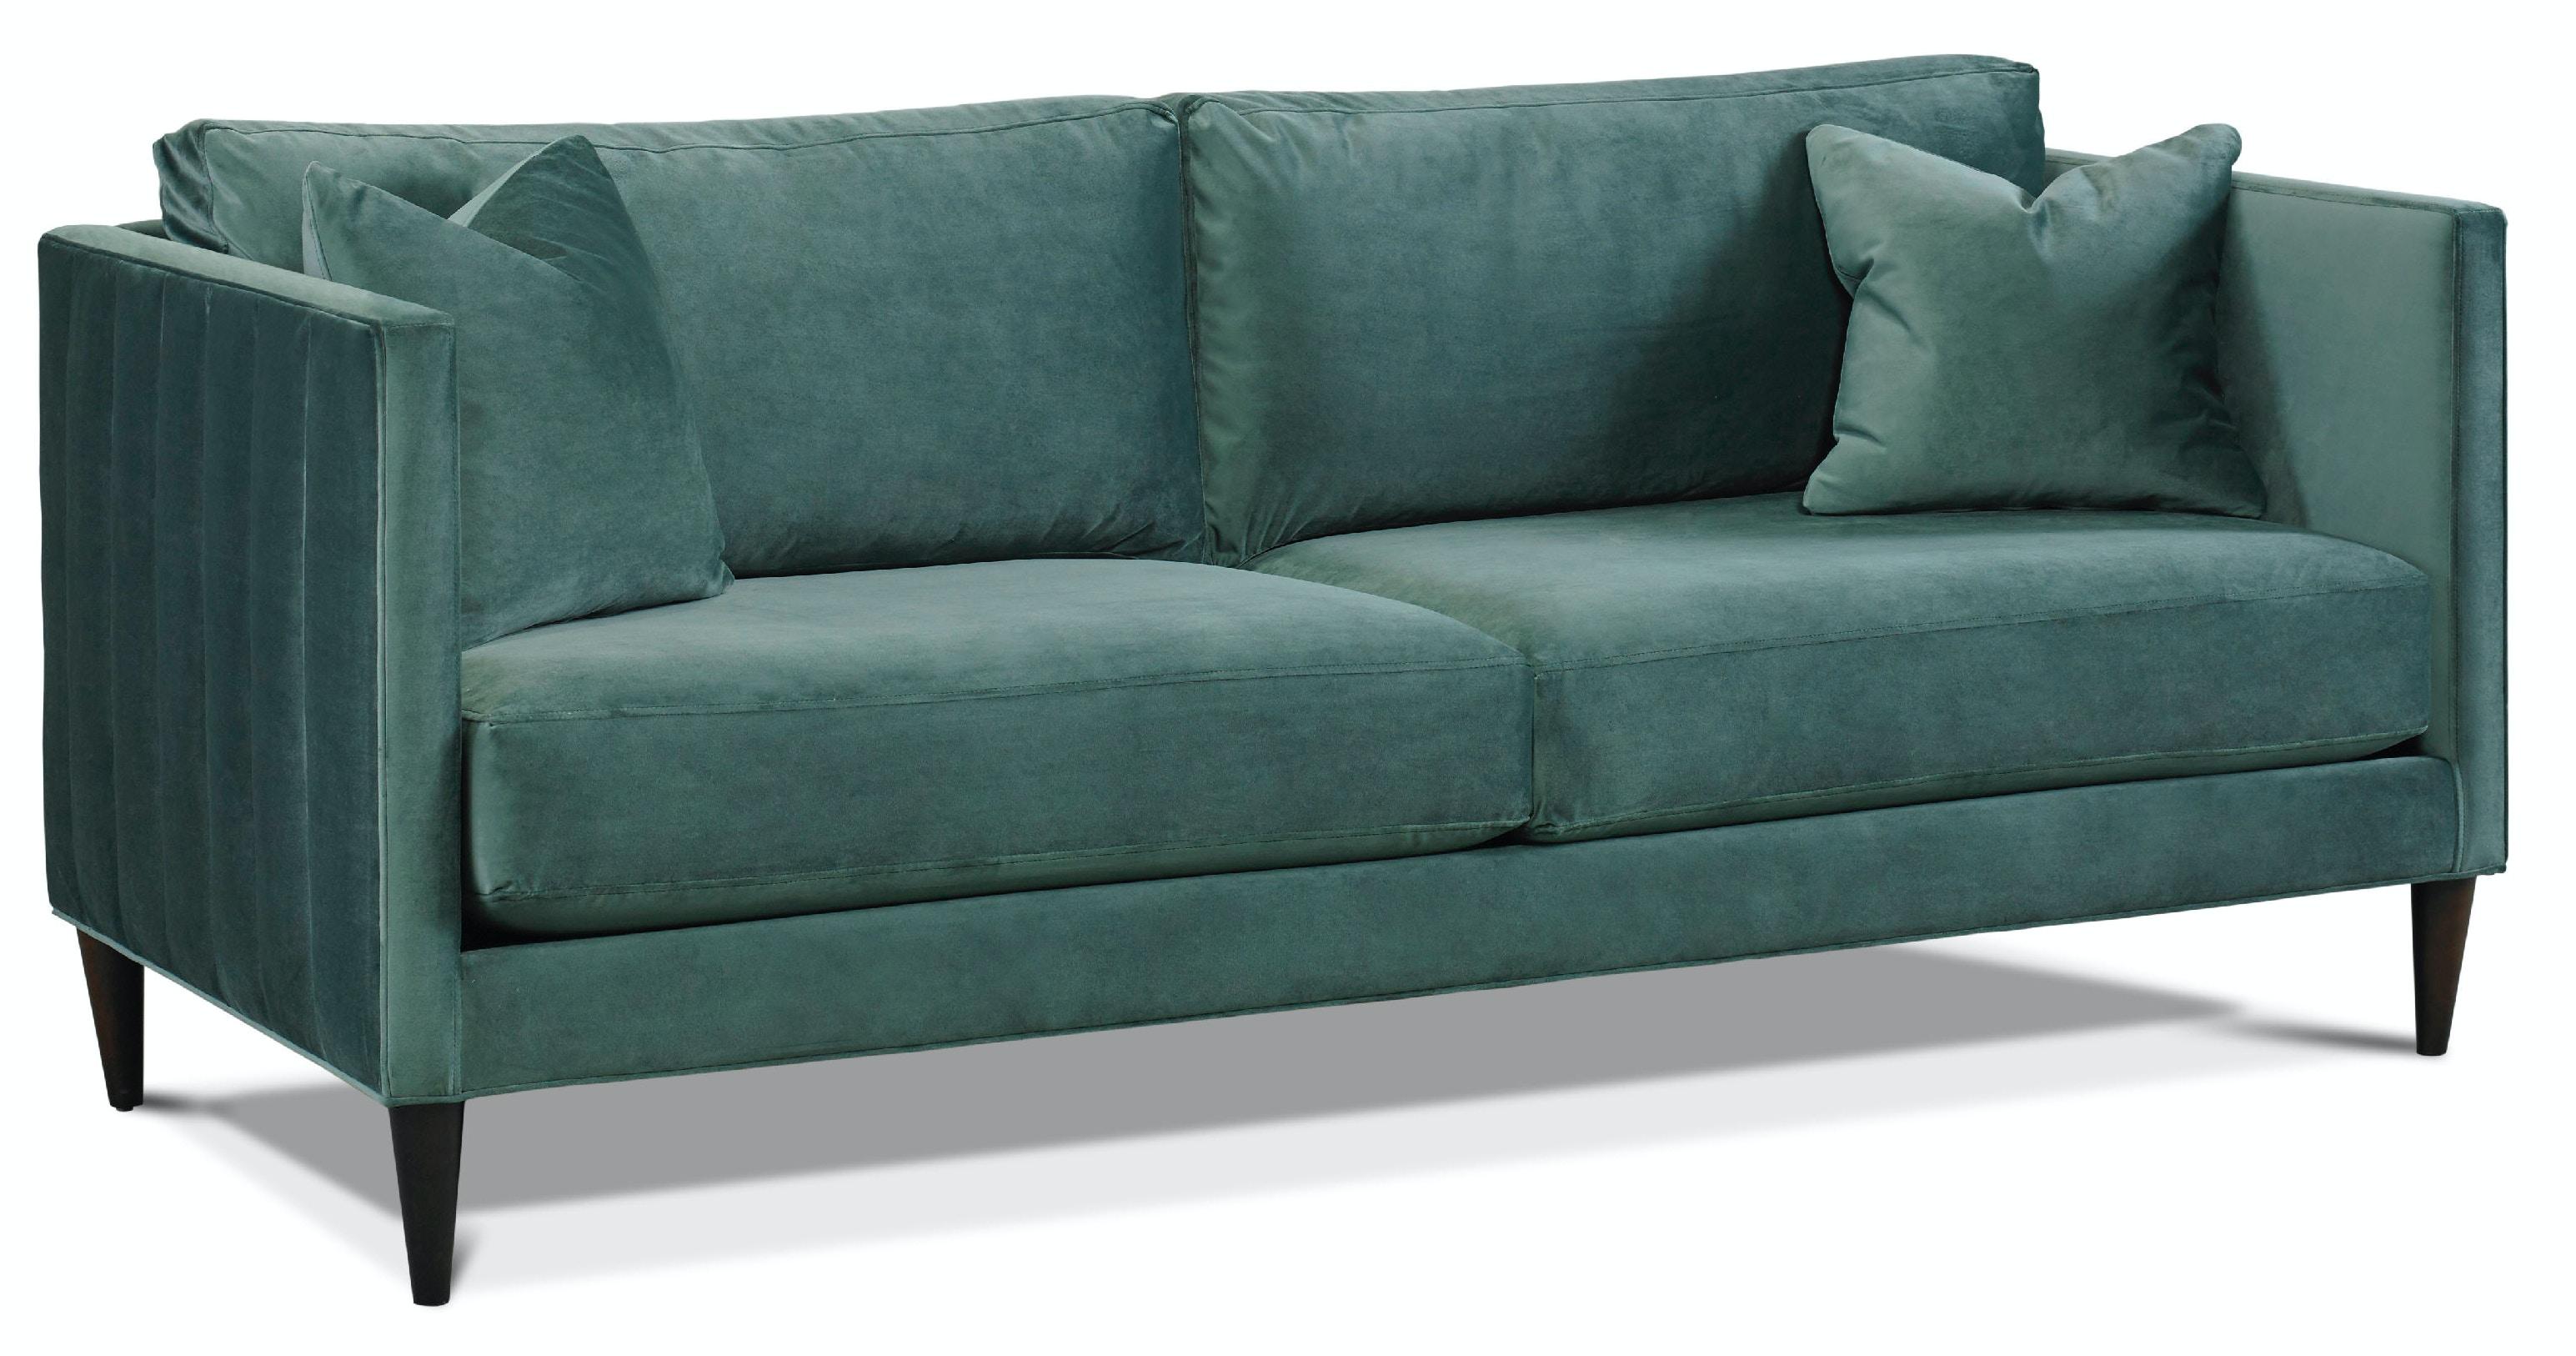 Precedent Furniture Living Room Michelle Sofa 3276 S1   Meg Brown Home  Furnishings   Advance, Winston Salem, Greensboro And Lexington, NC